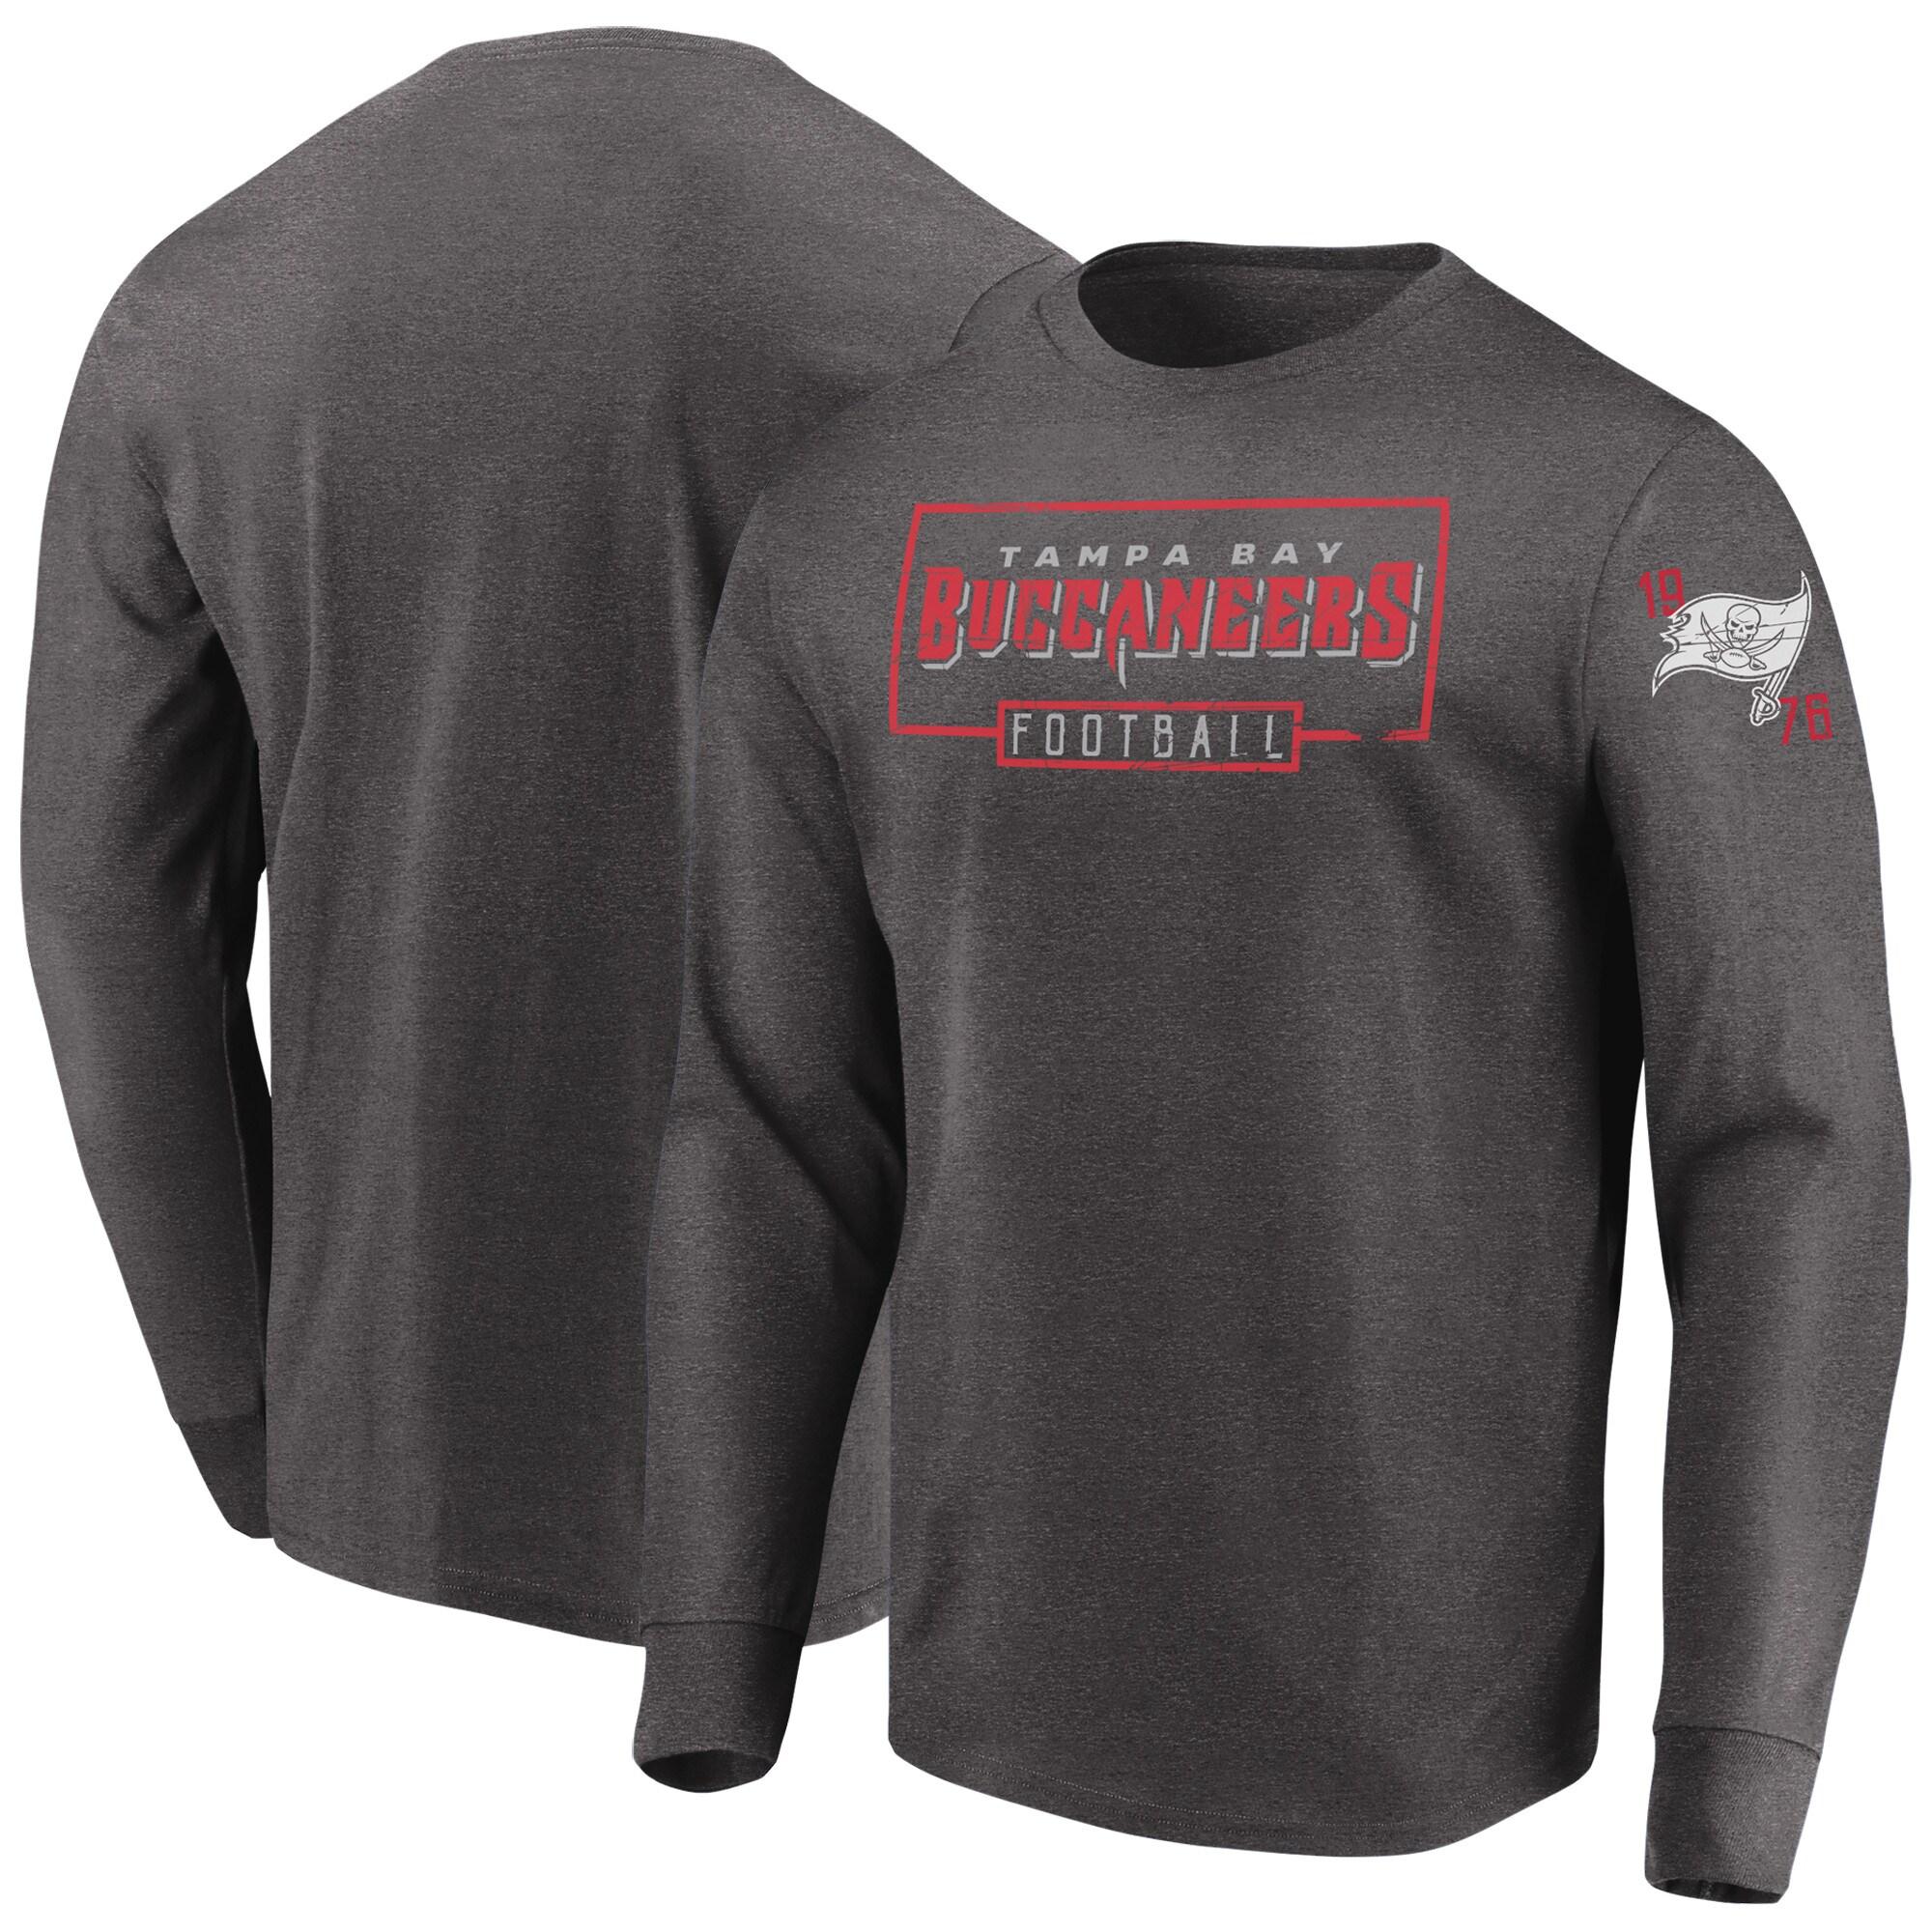 Tampa Bay Buccaneers Majestic Kick Return Long Sleeve T-Shirt - Heathered Charcoal